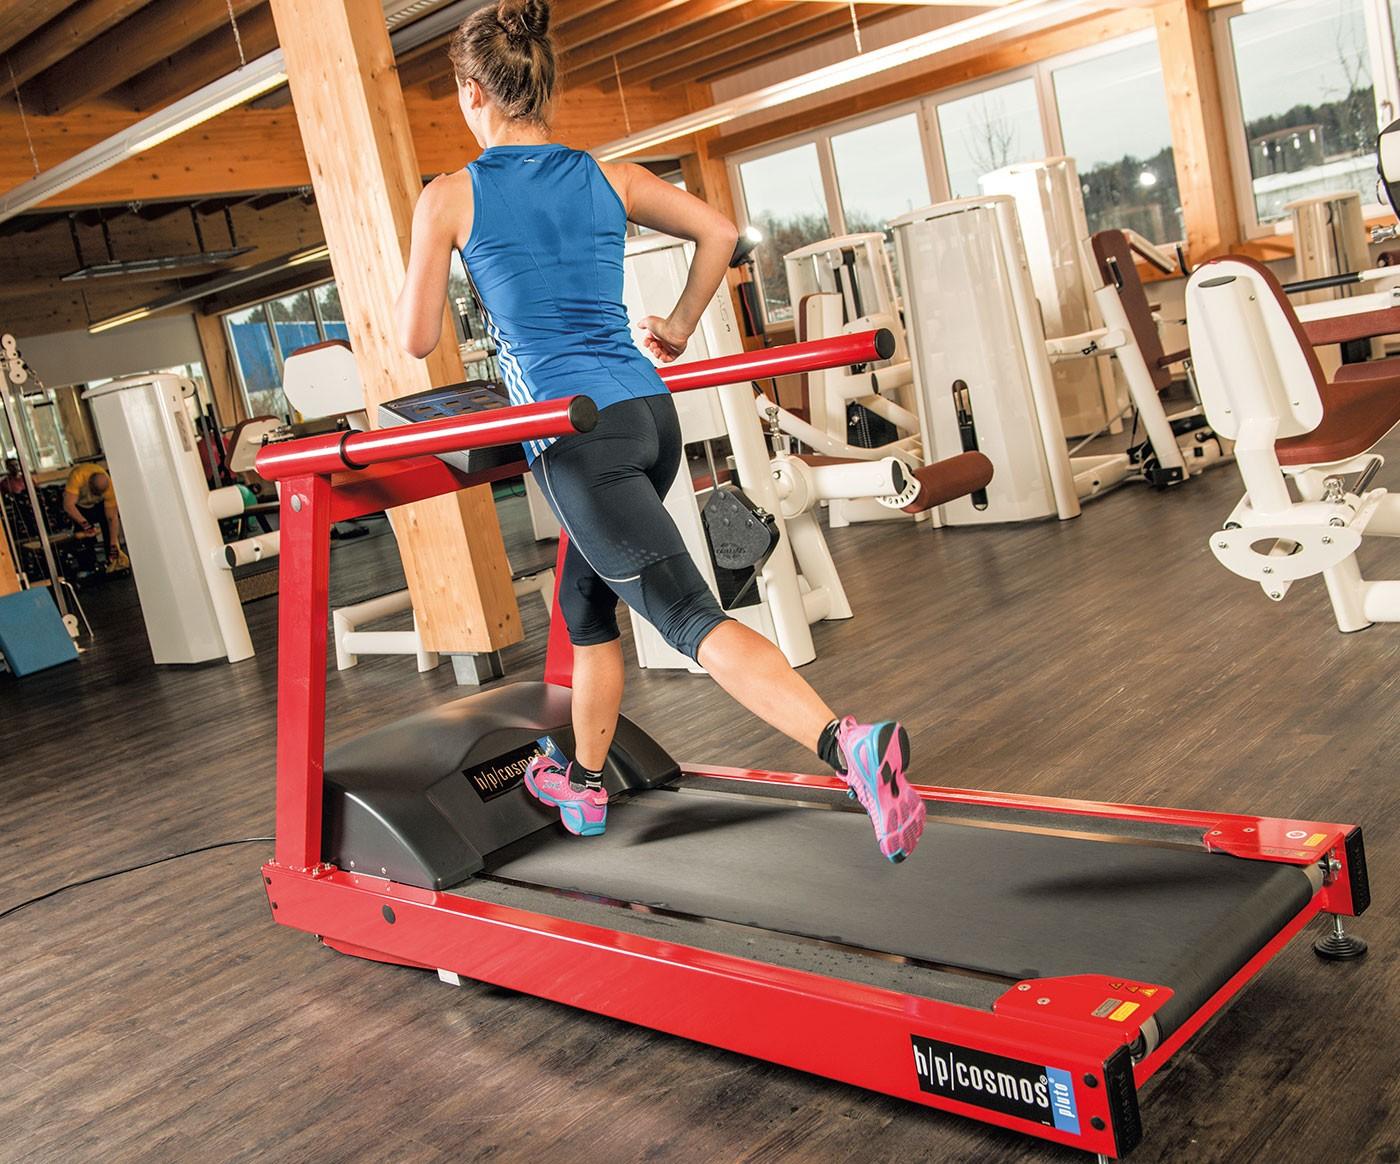 h/p/cosmos treadmill ergometer pluto: very low maintenance, comfortable running surface, advanced construction.